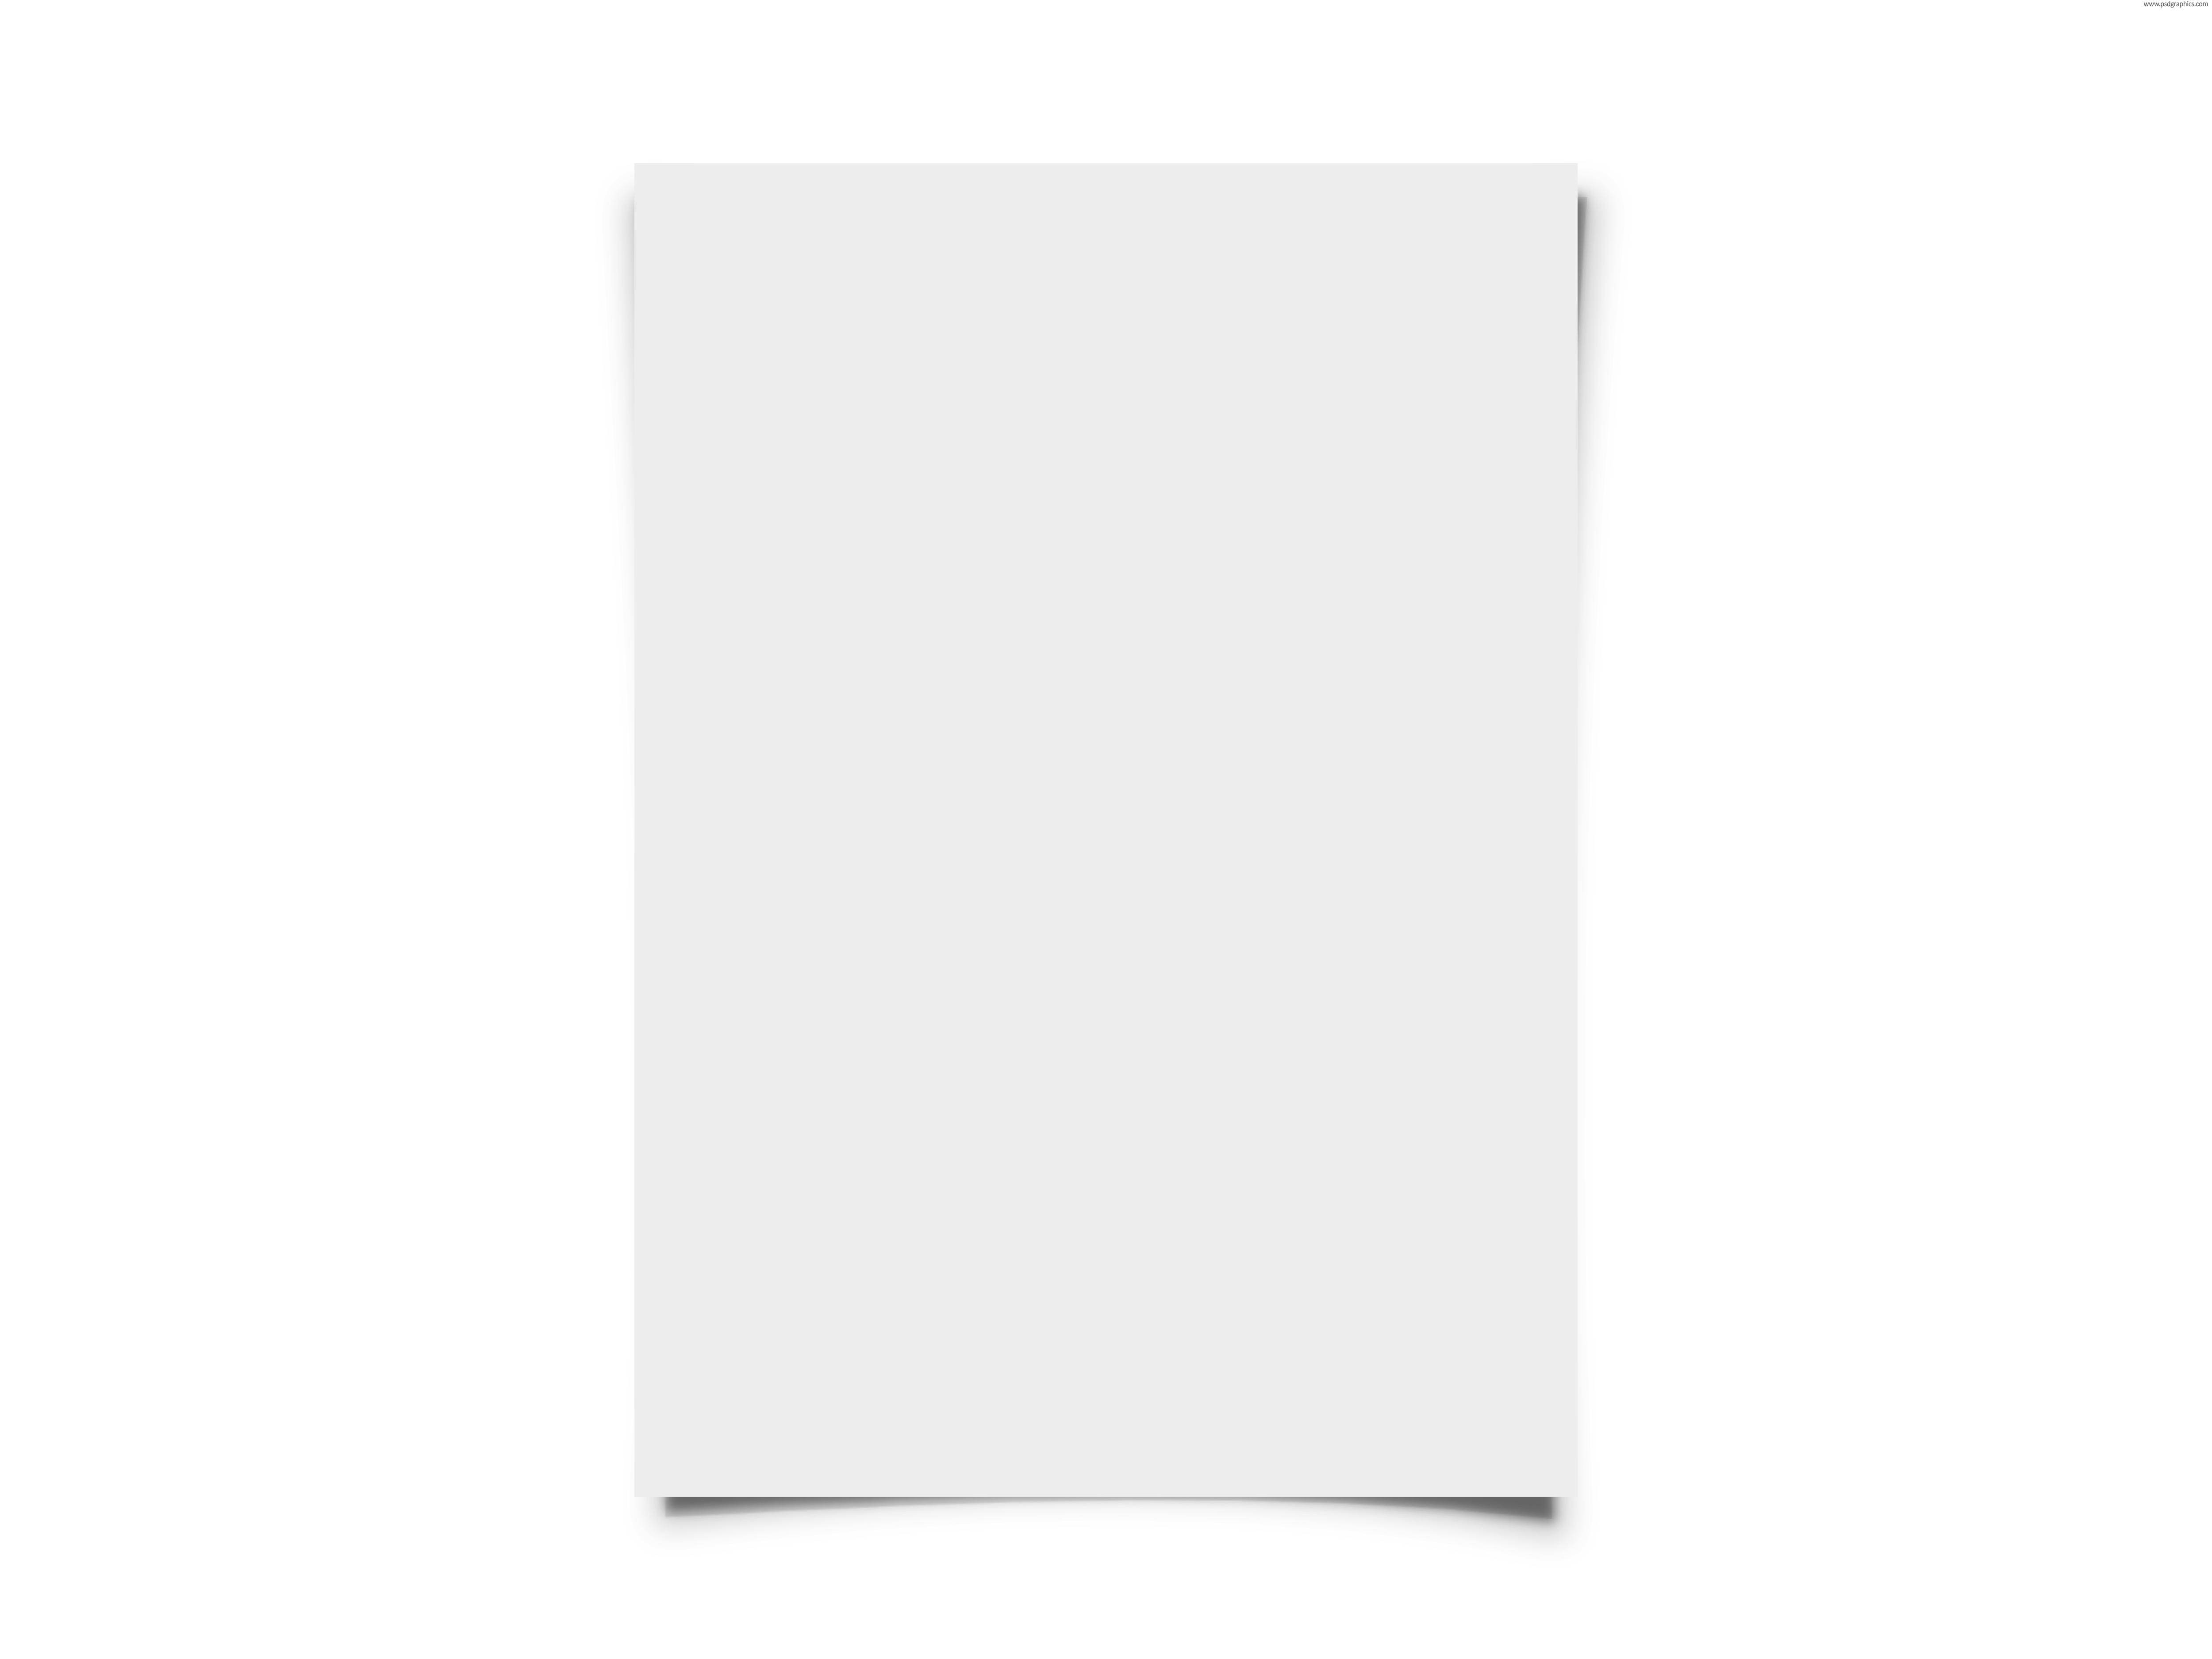 Blank white paper PSDGraphics 5000x3750